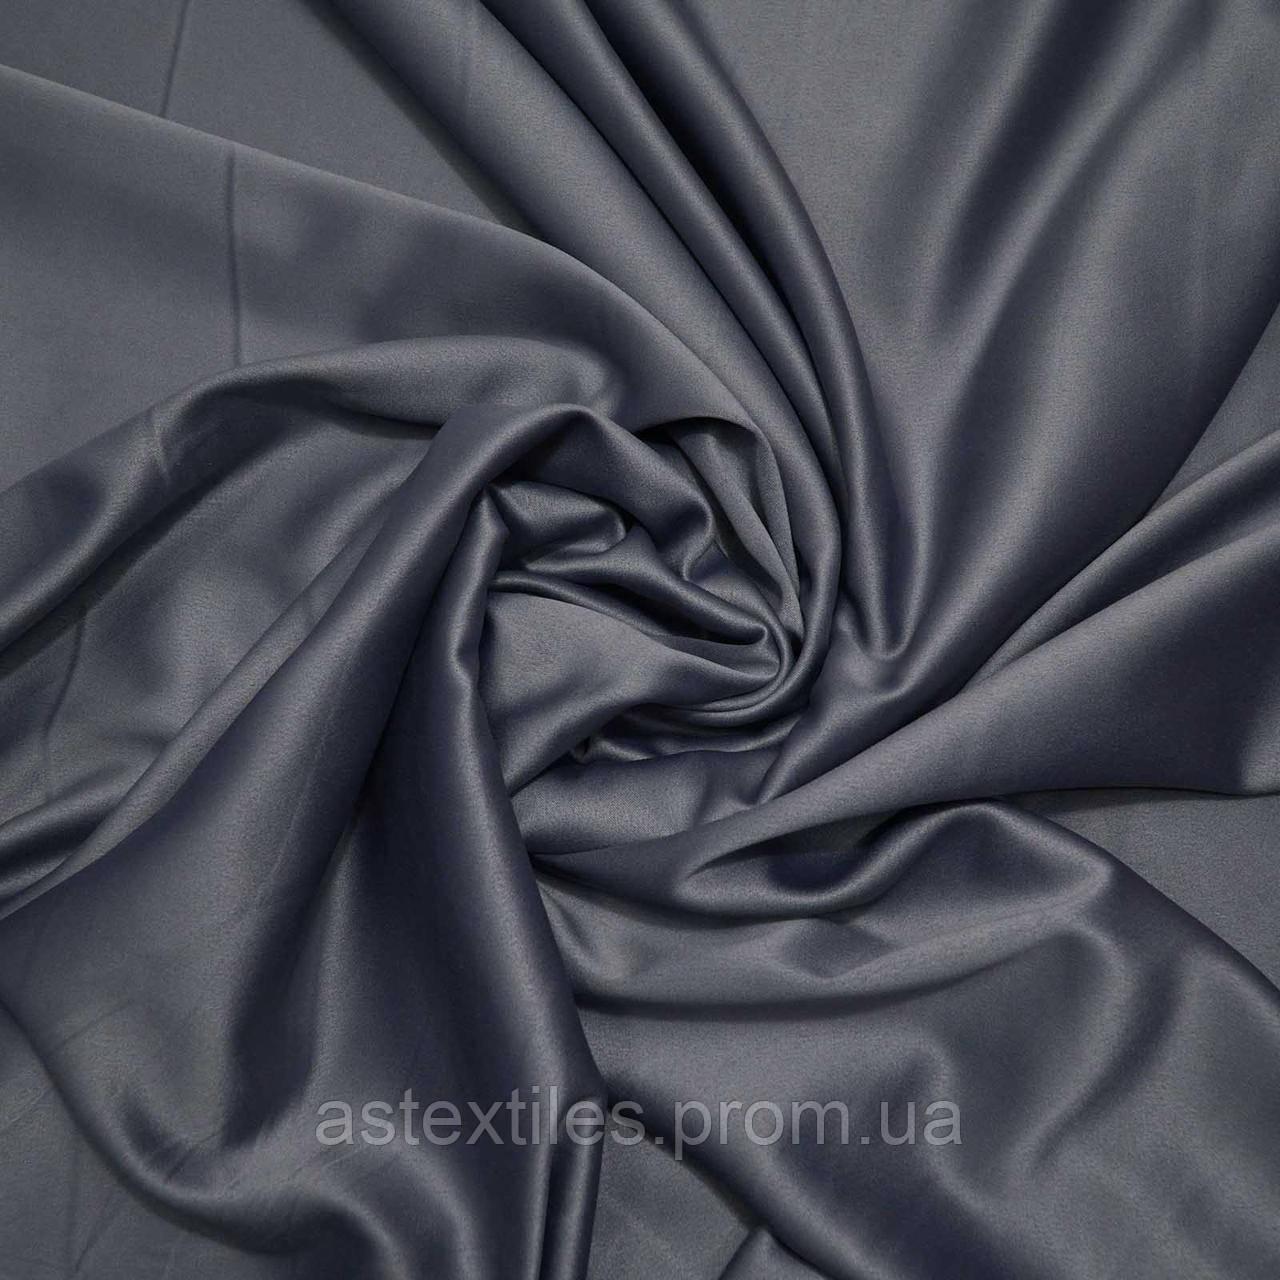 Королевский атлас (темно-серый)